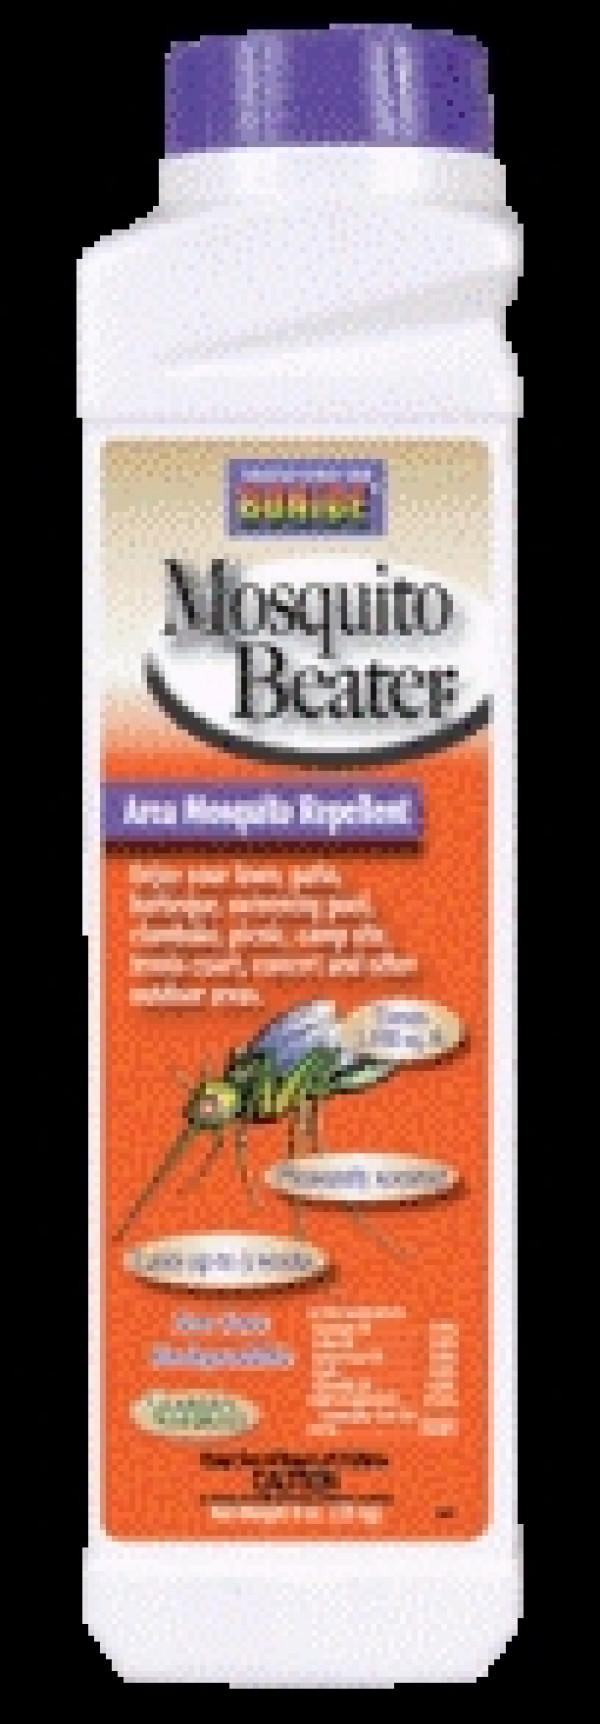 Bonide Mosquito Beater 8 Oz.